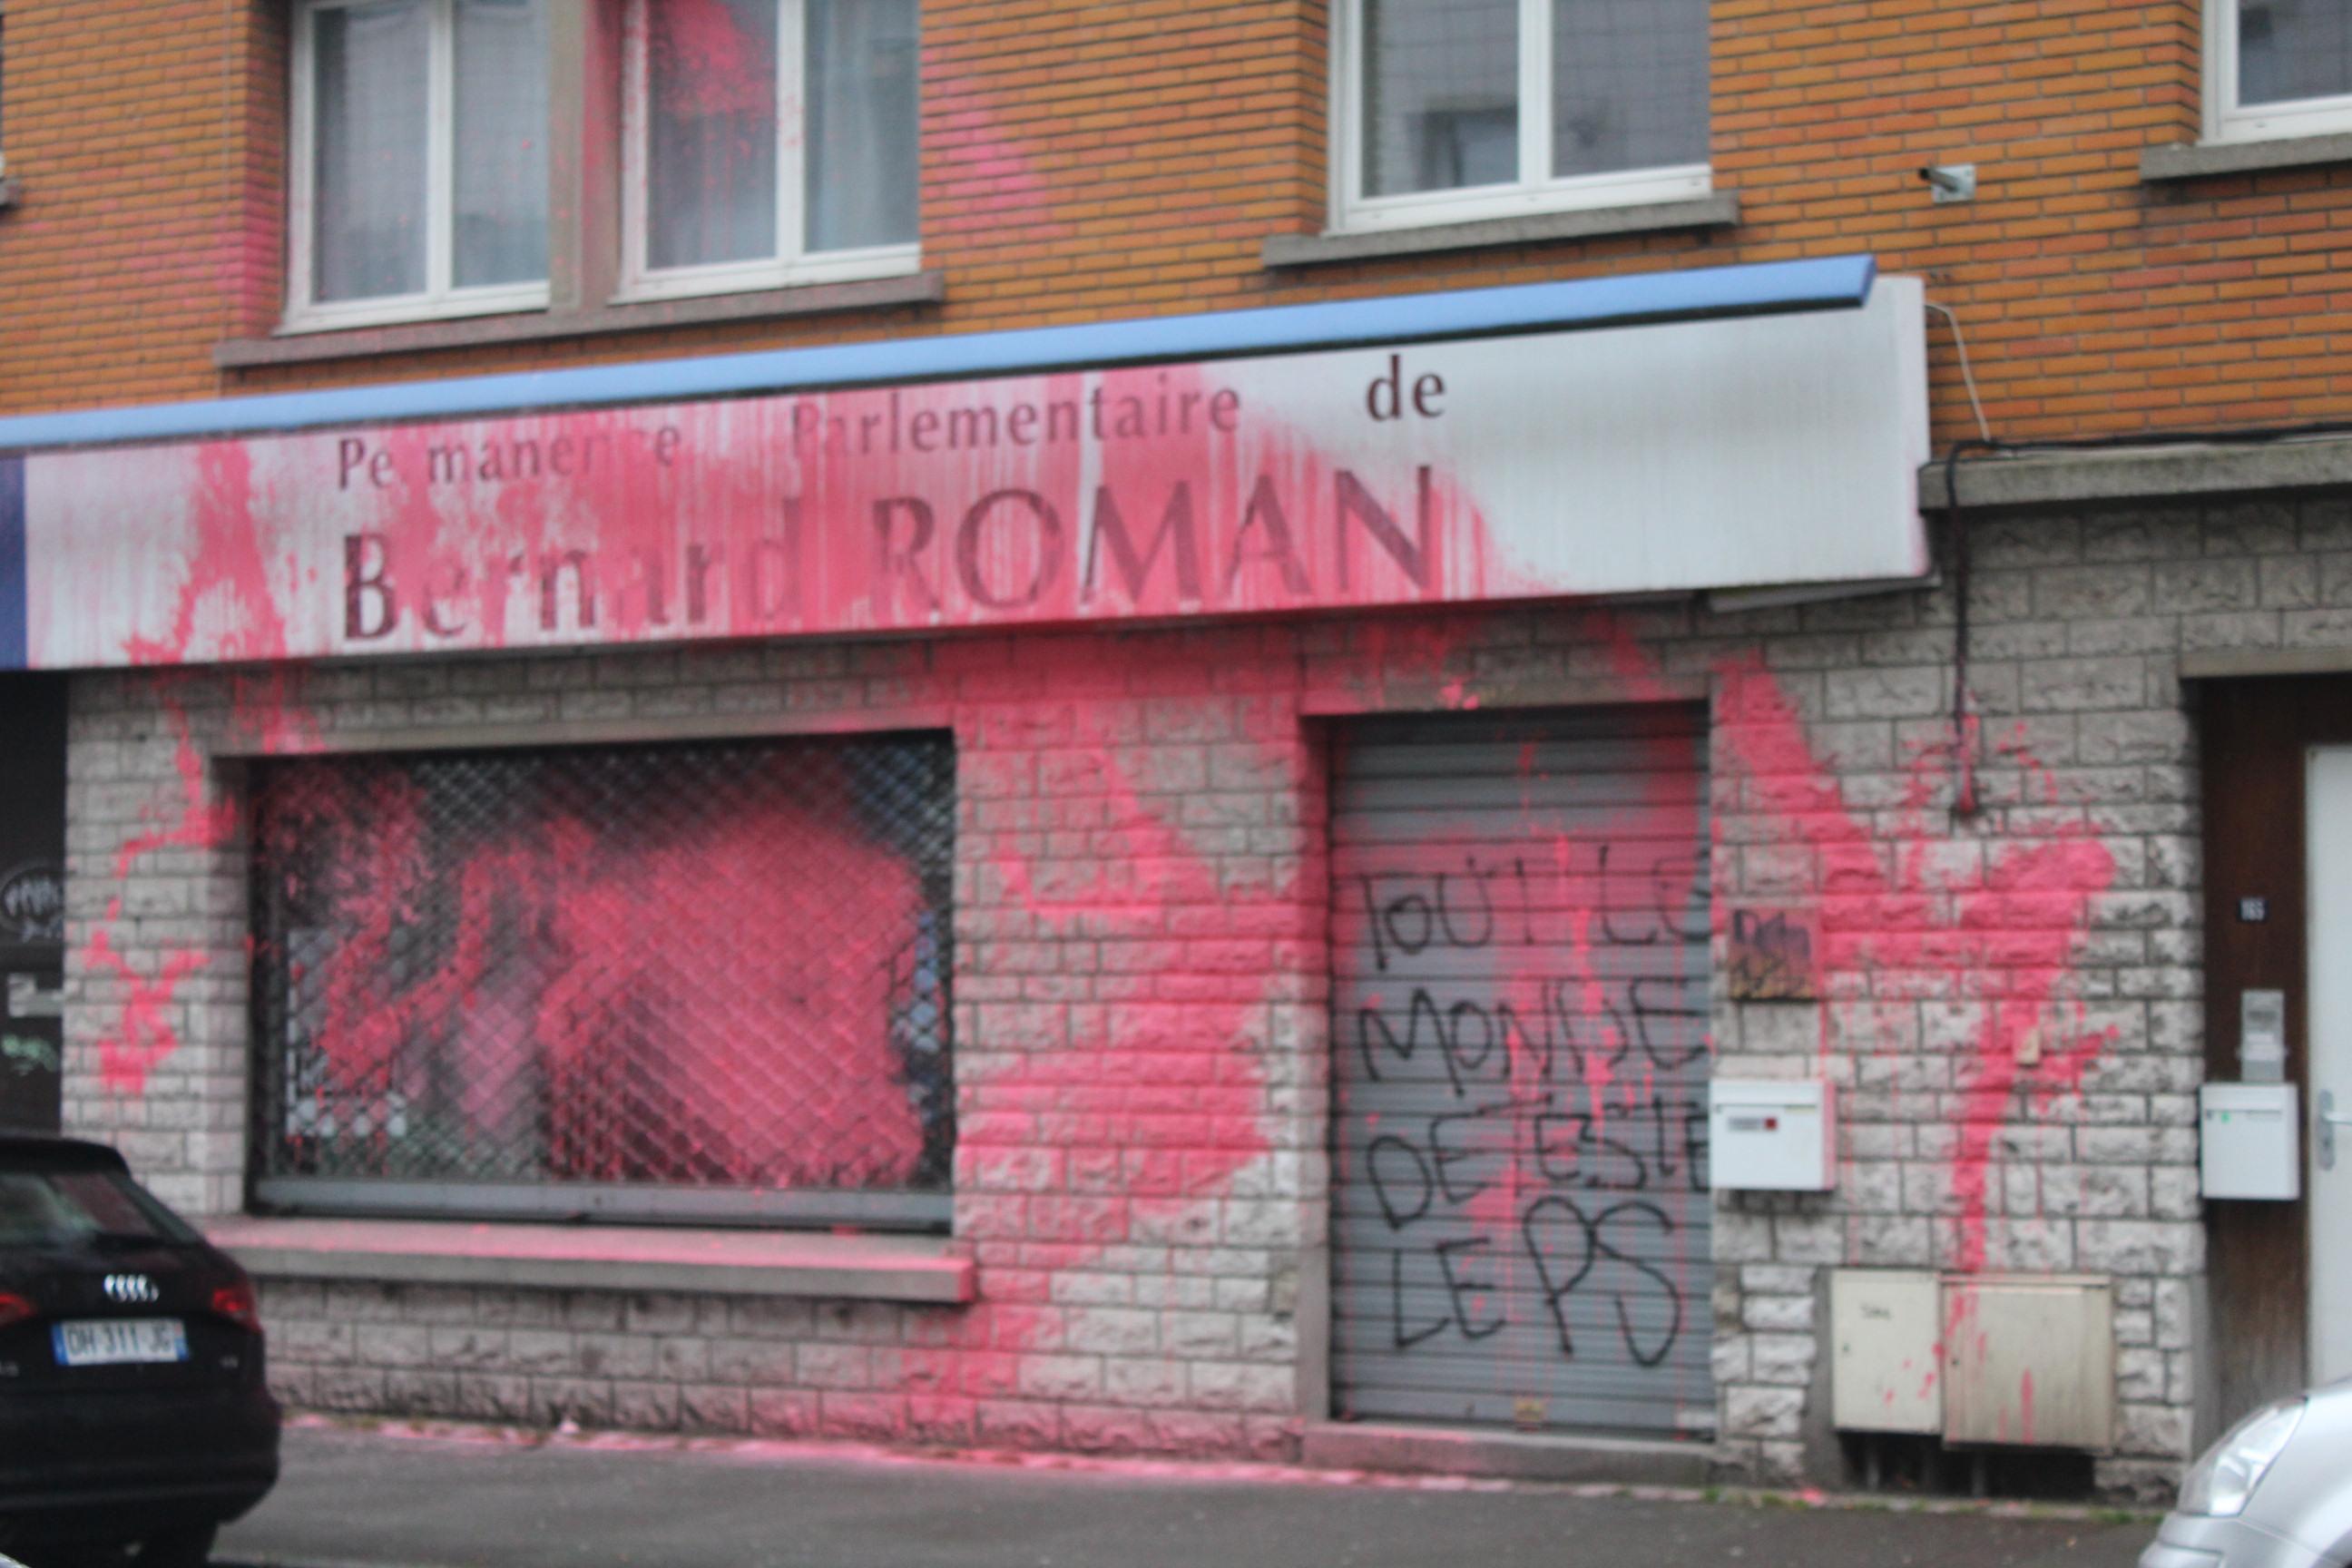 Lille perm B. Roman 15 4 2016